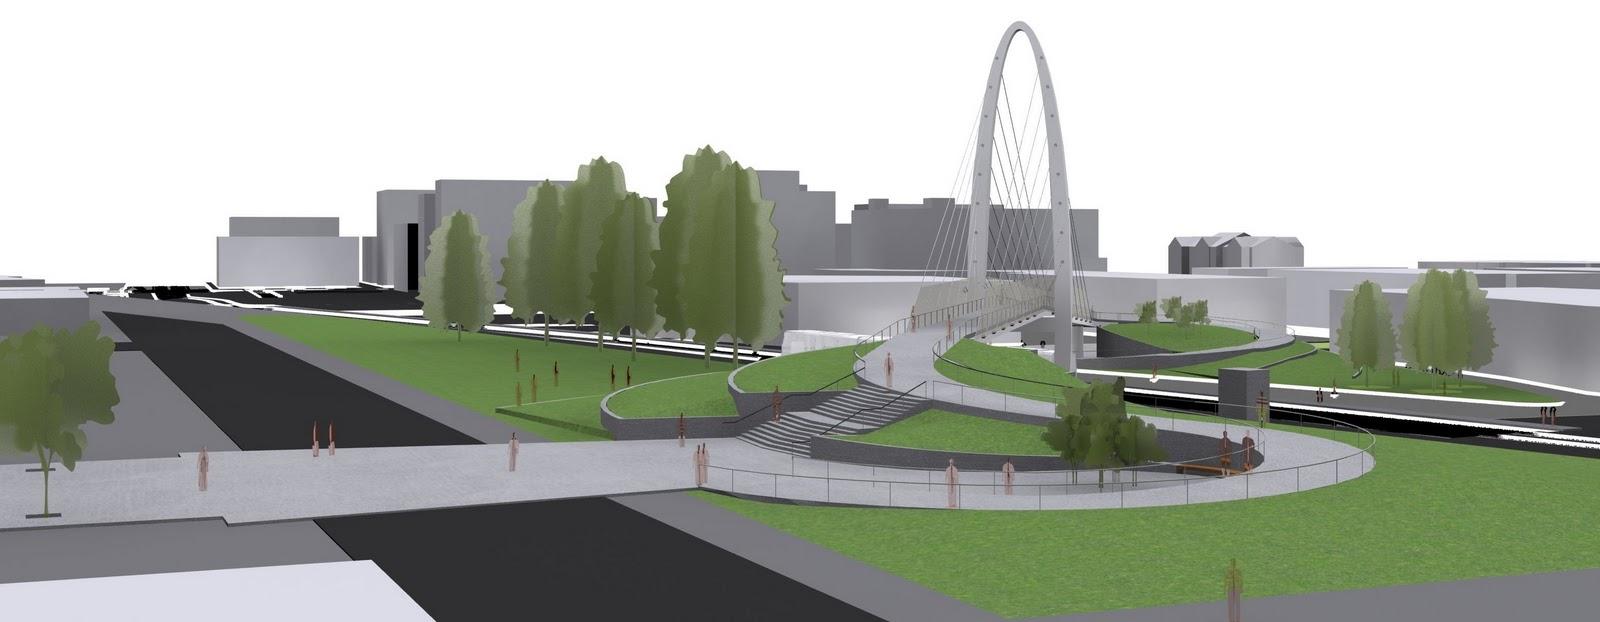 Cable-stayed bridge | Spokane Economic And Demographic Data